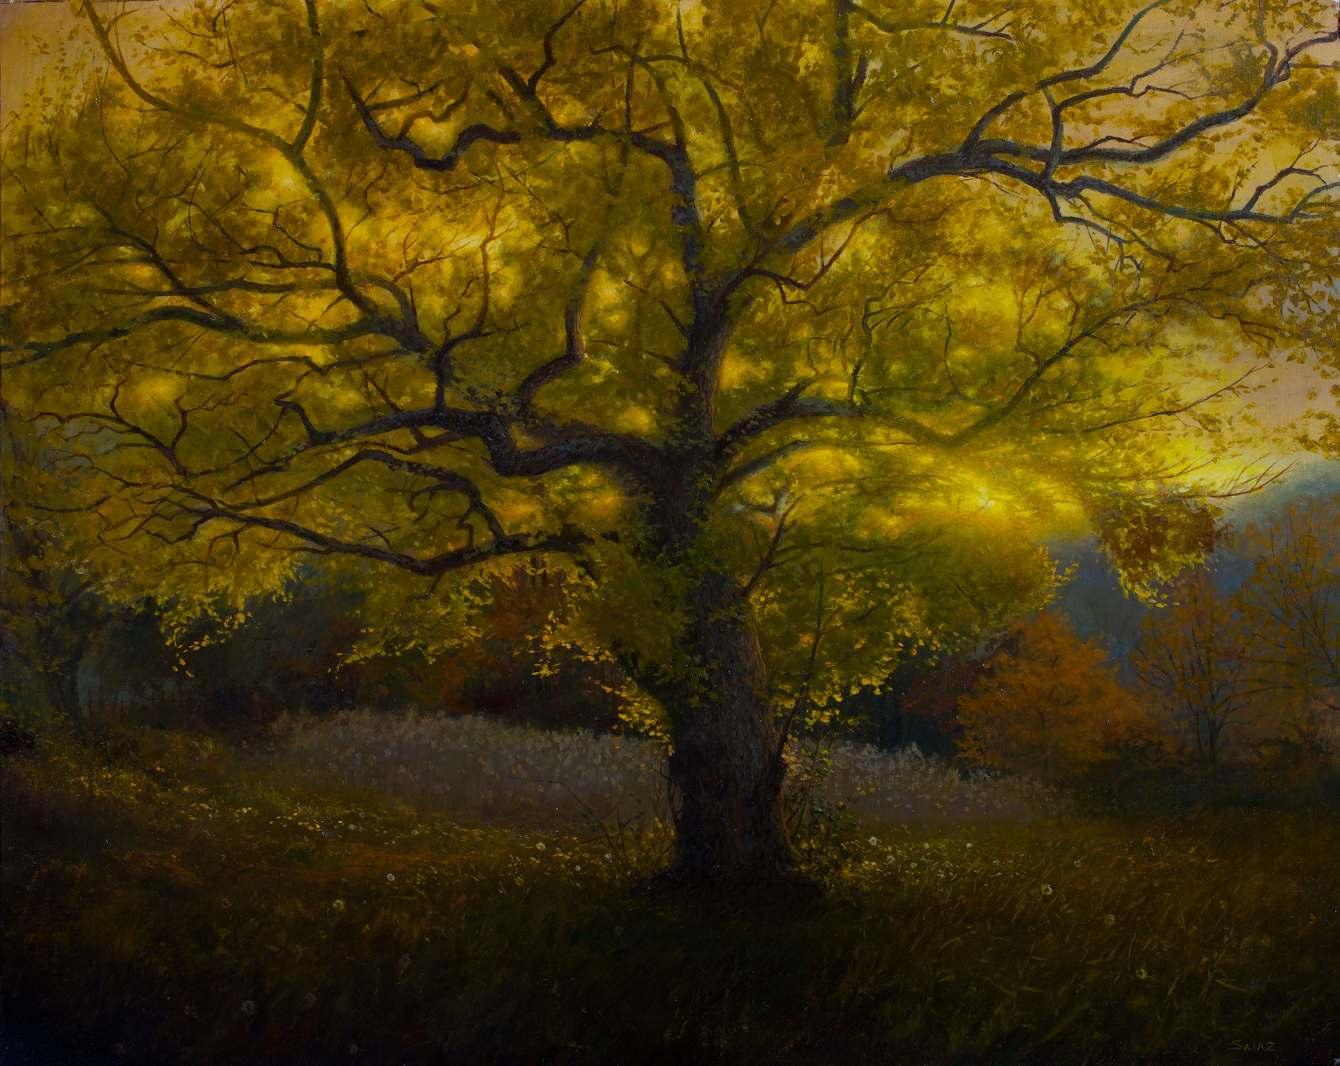 Buddah-Tree-OIl-on-Linen-2016-16-x-20-copy_1340_c.jpg